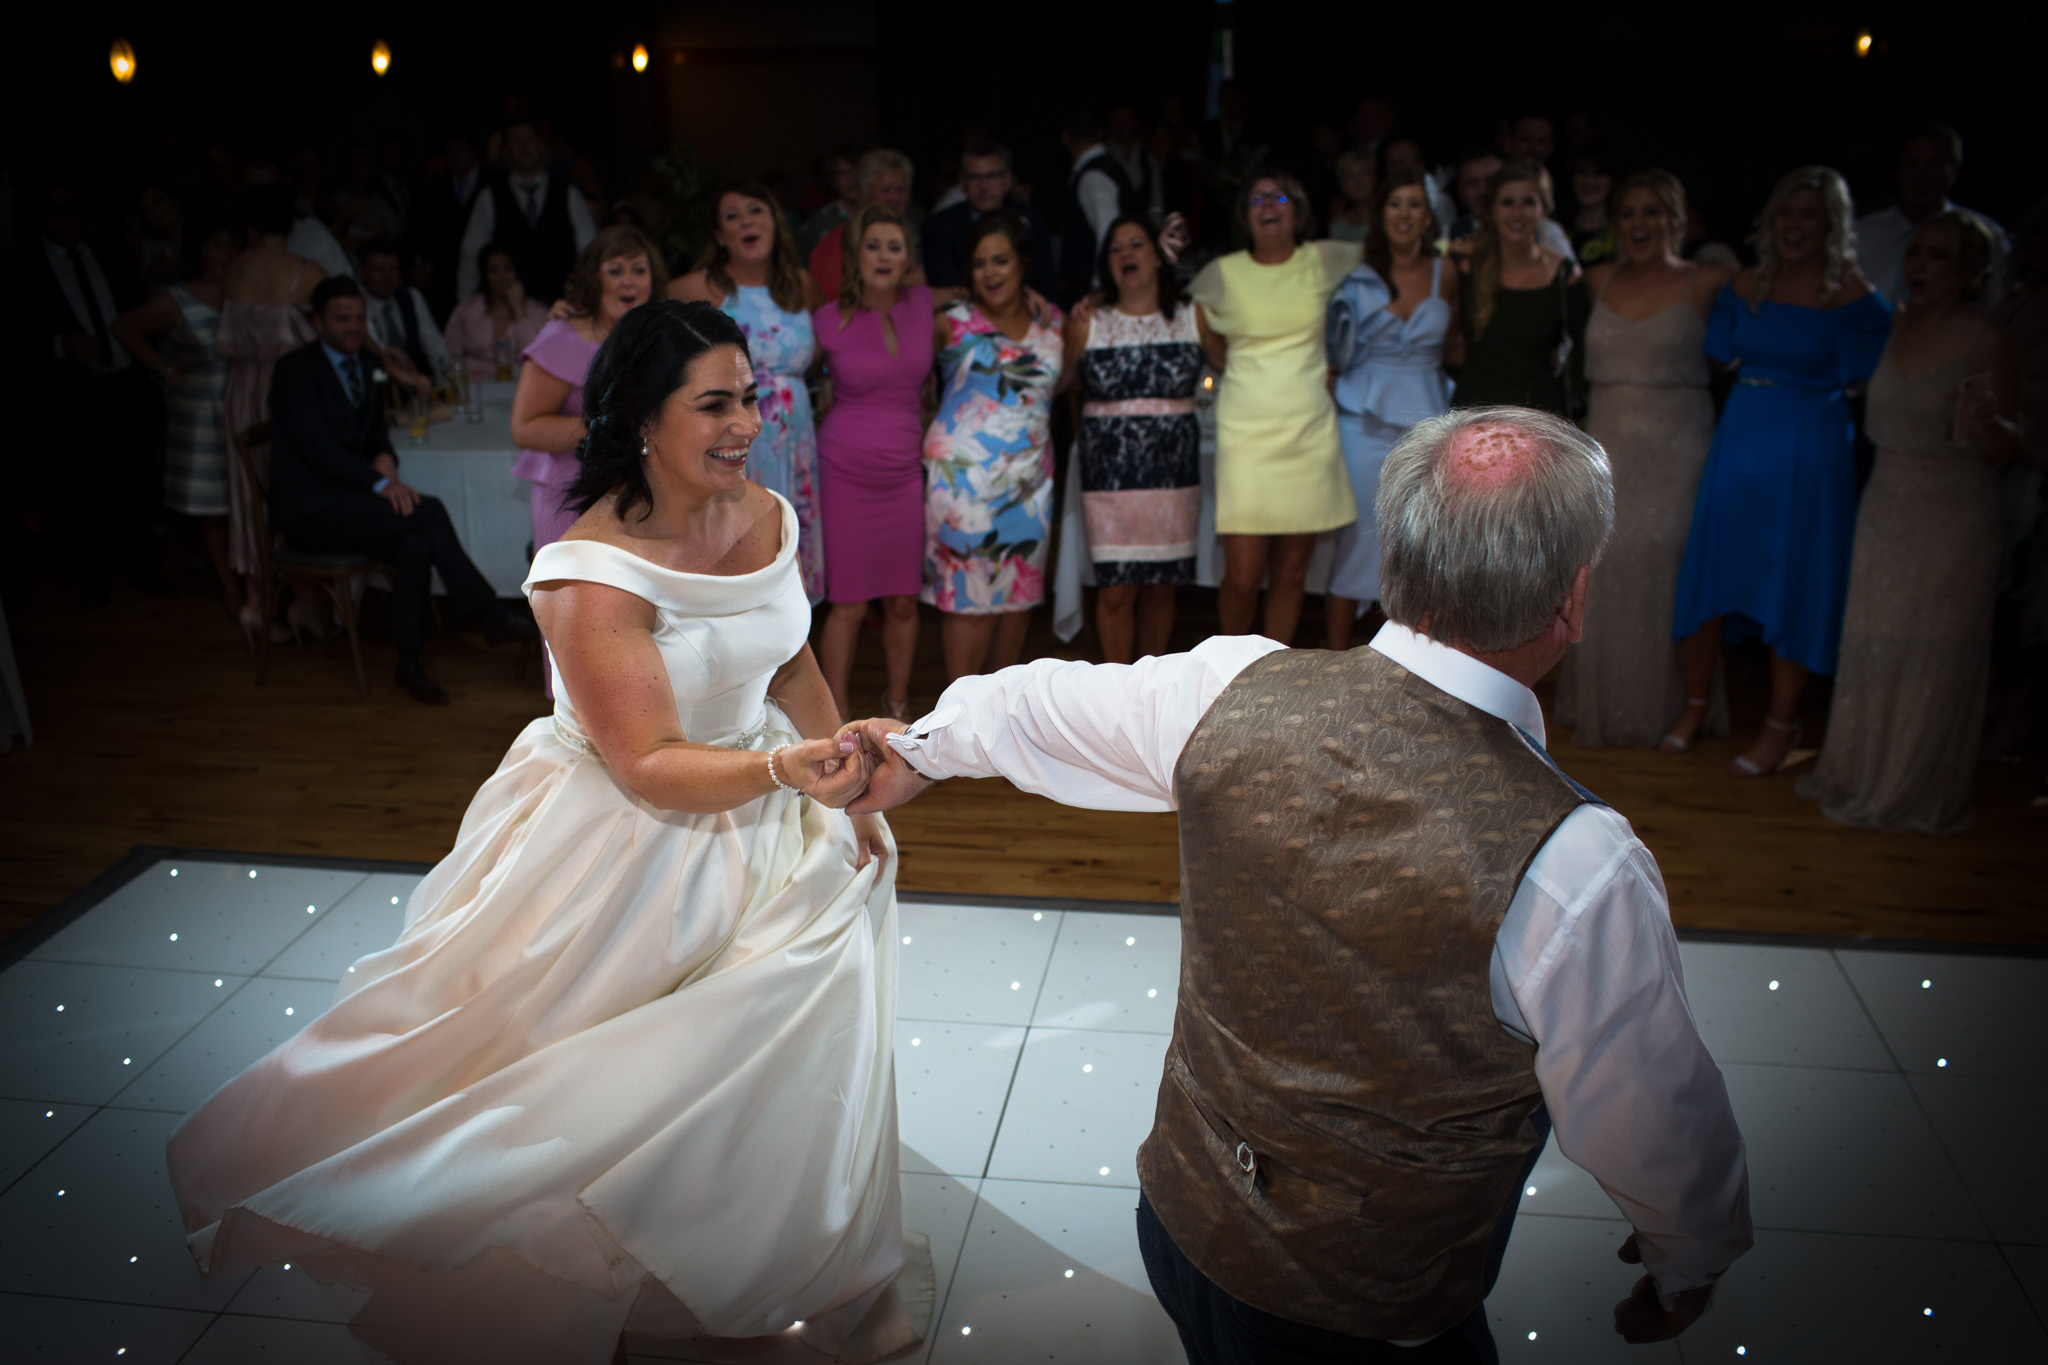 Mark_Barnes_Northern_Ireland_Wedding_Photography_Lusty_Beg_Wedding_Photography_Hayley&Brian-48.jpg